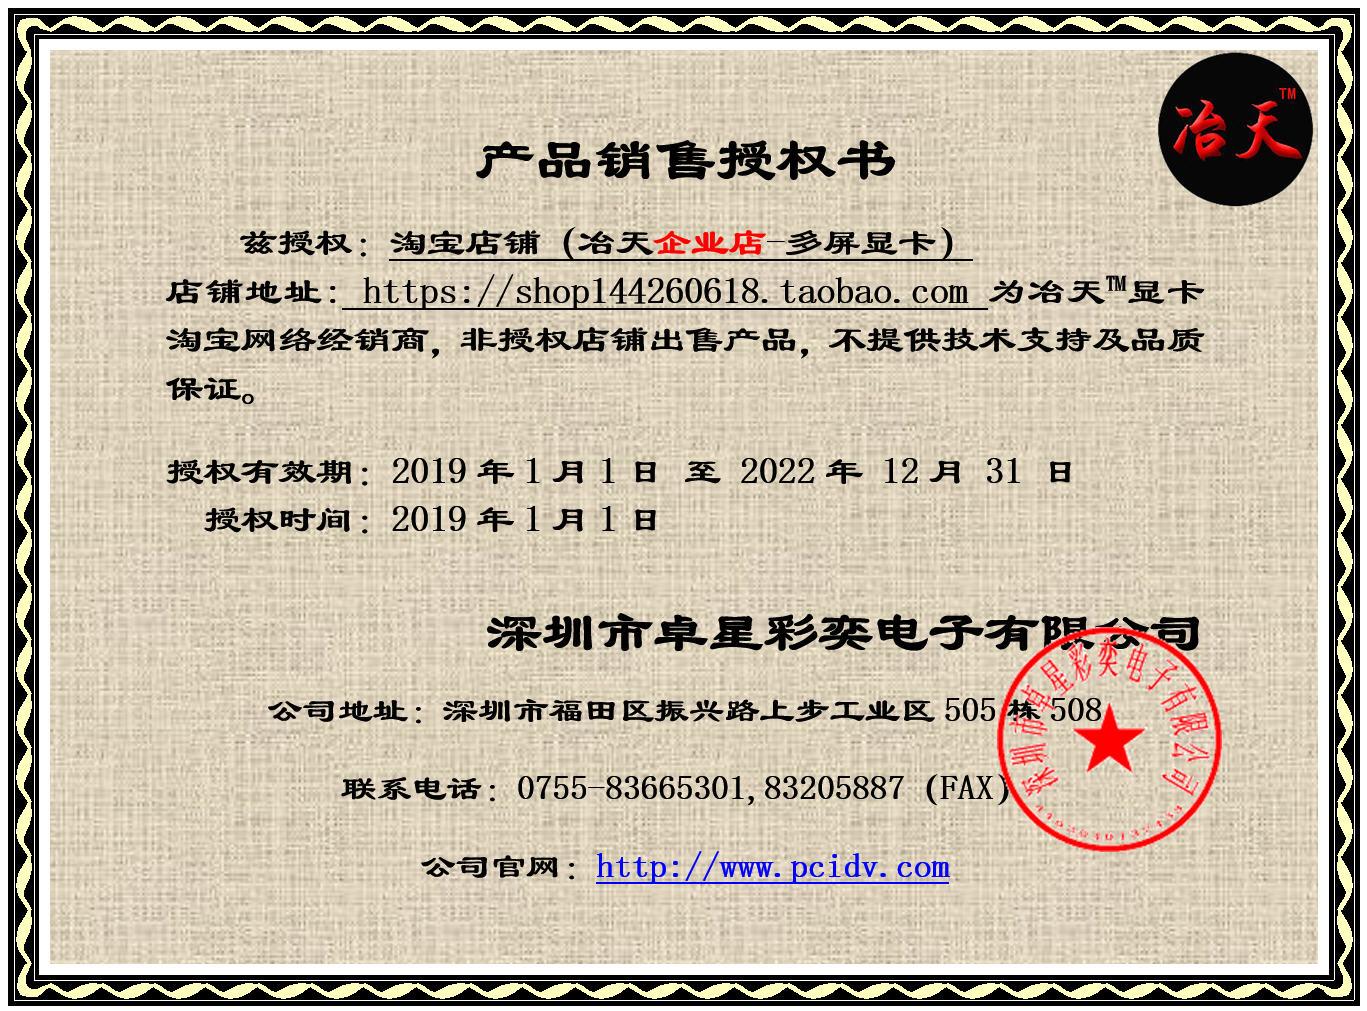 pcidv.com/冶天多屏显卡淘宝企业店授权